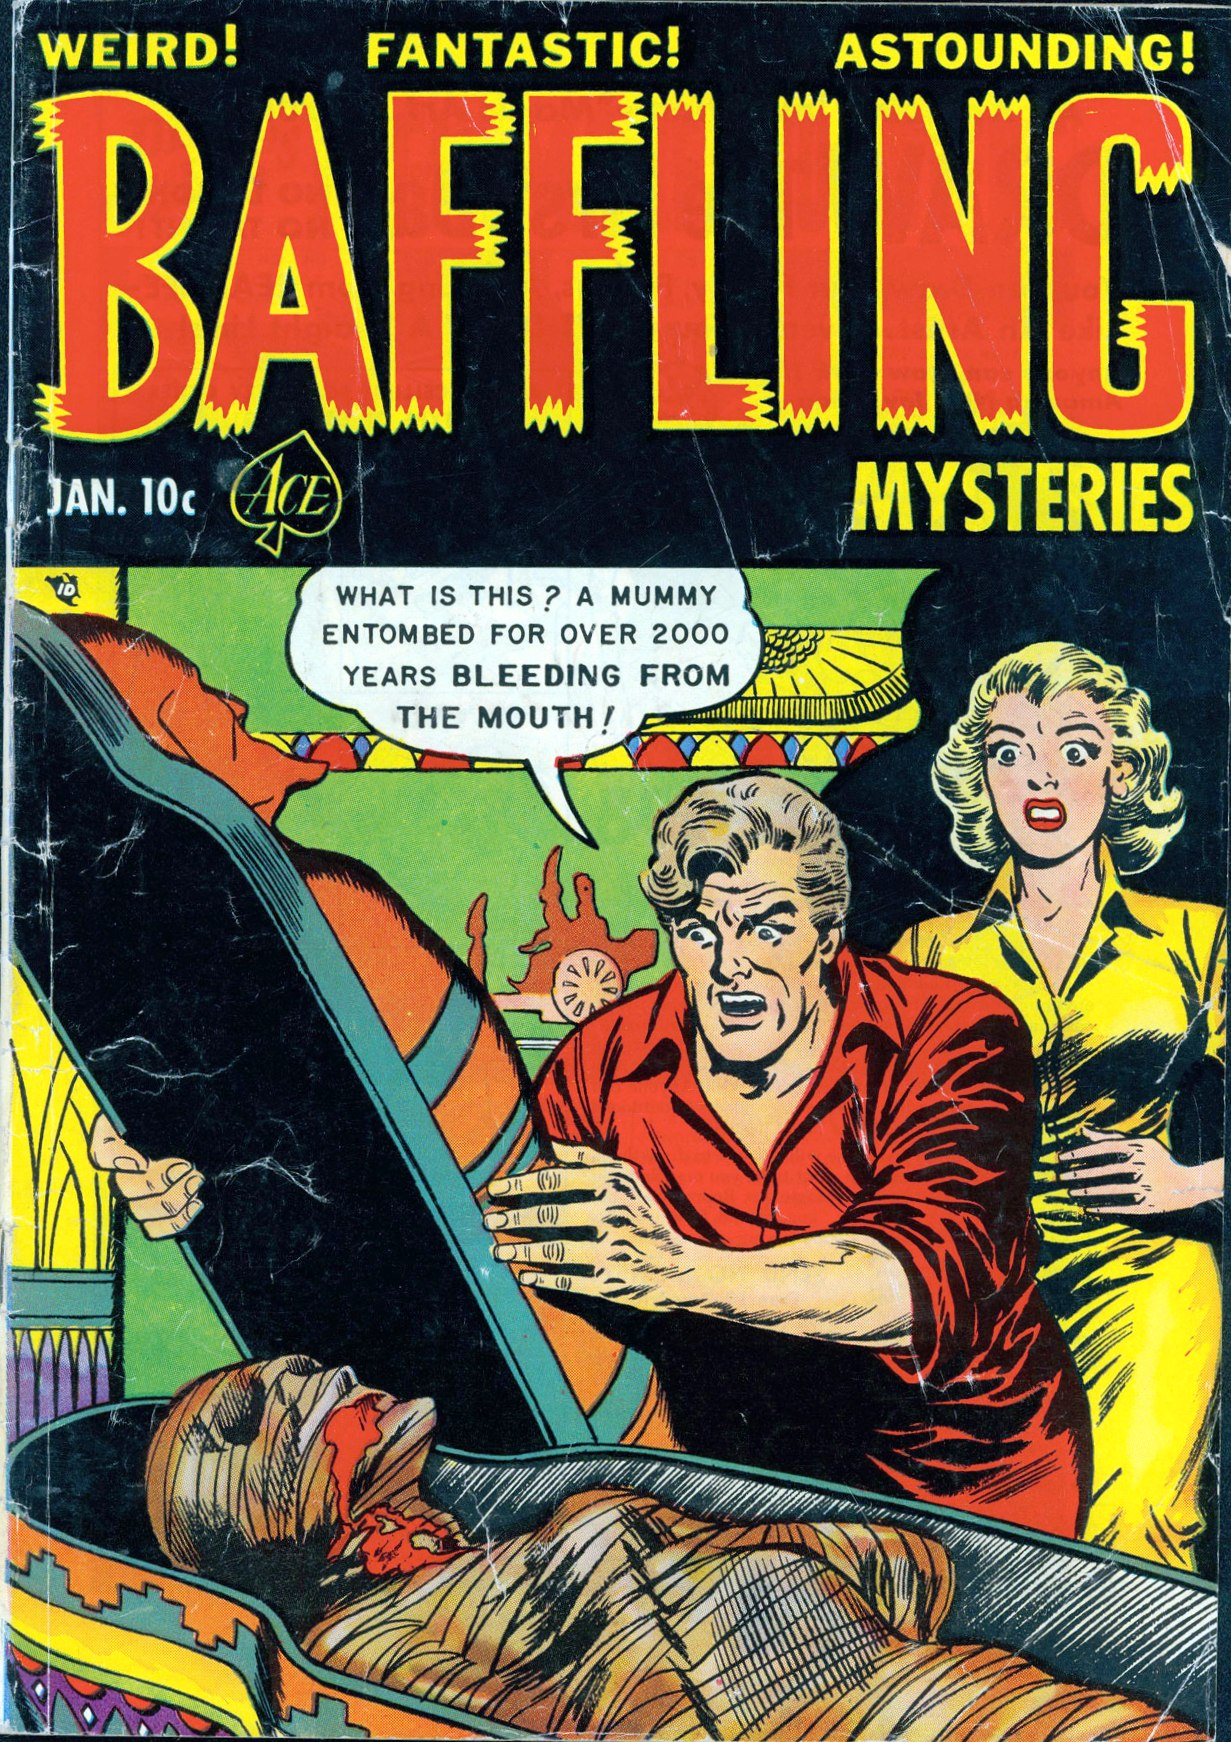 Baffling Mysteries Vol 1 13